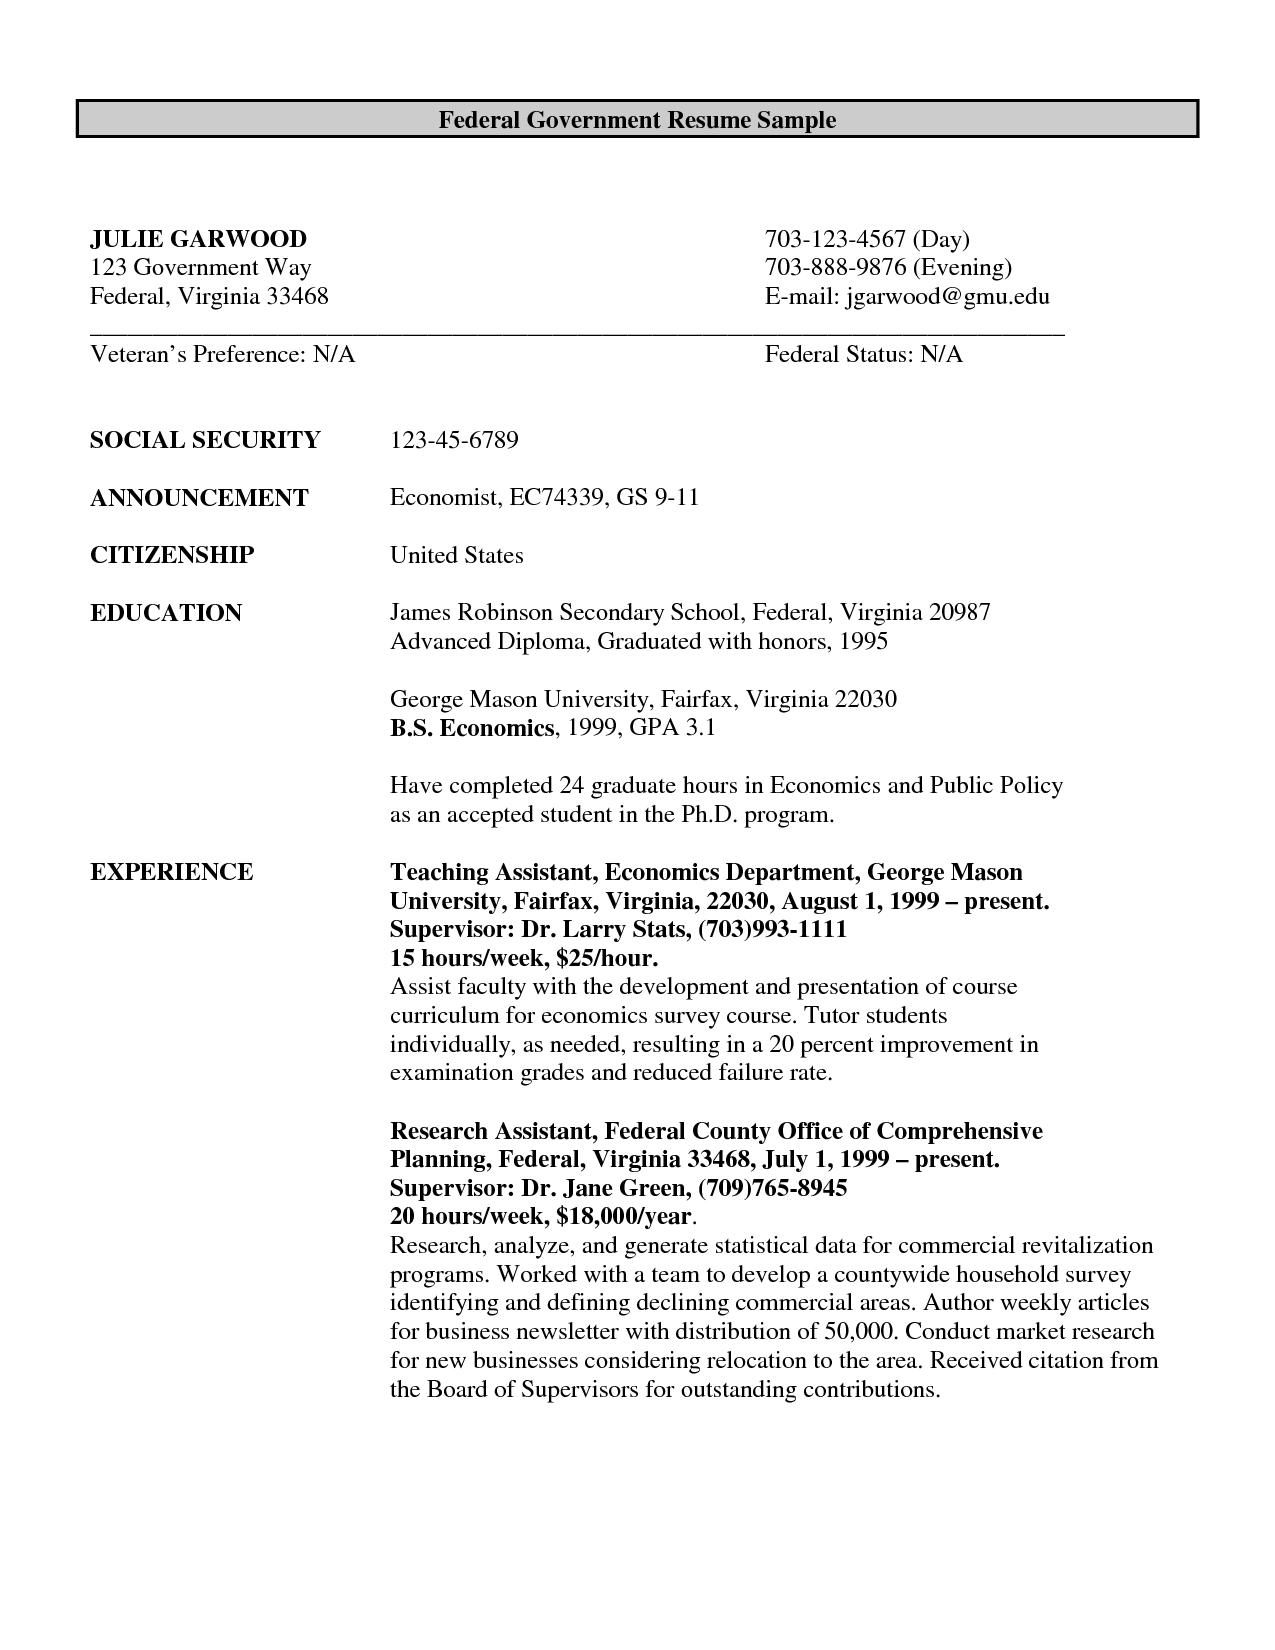 Pin by jobresume on Resume Career termplate free Federal